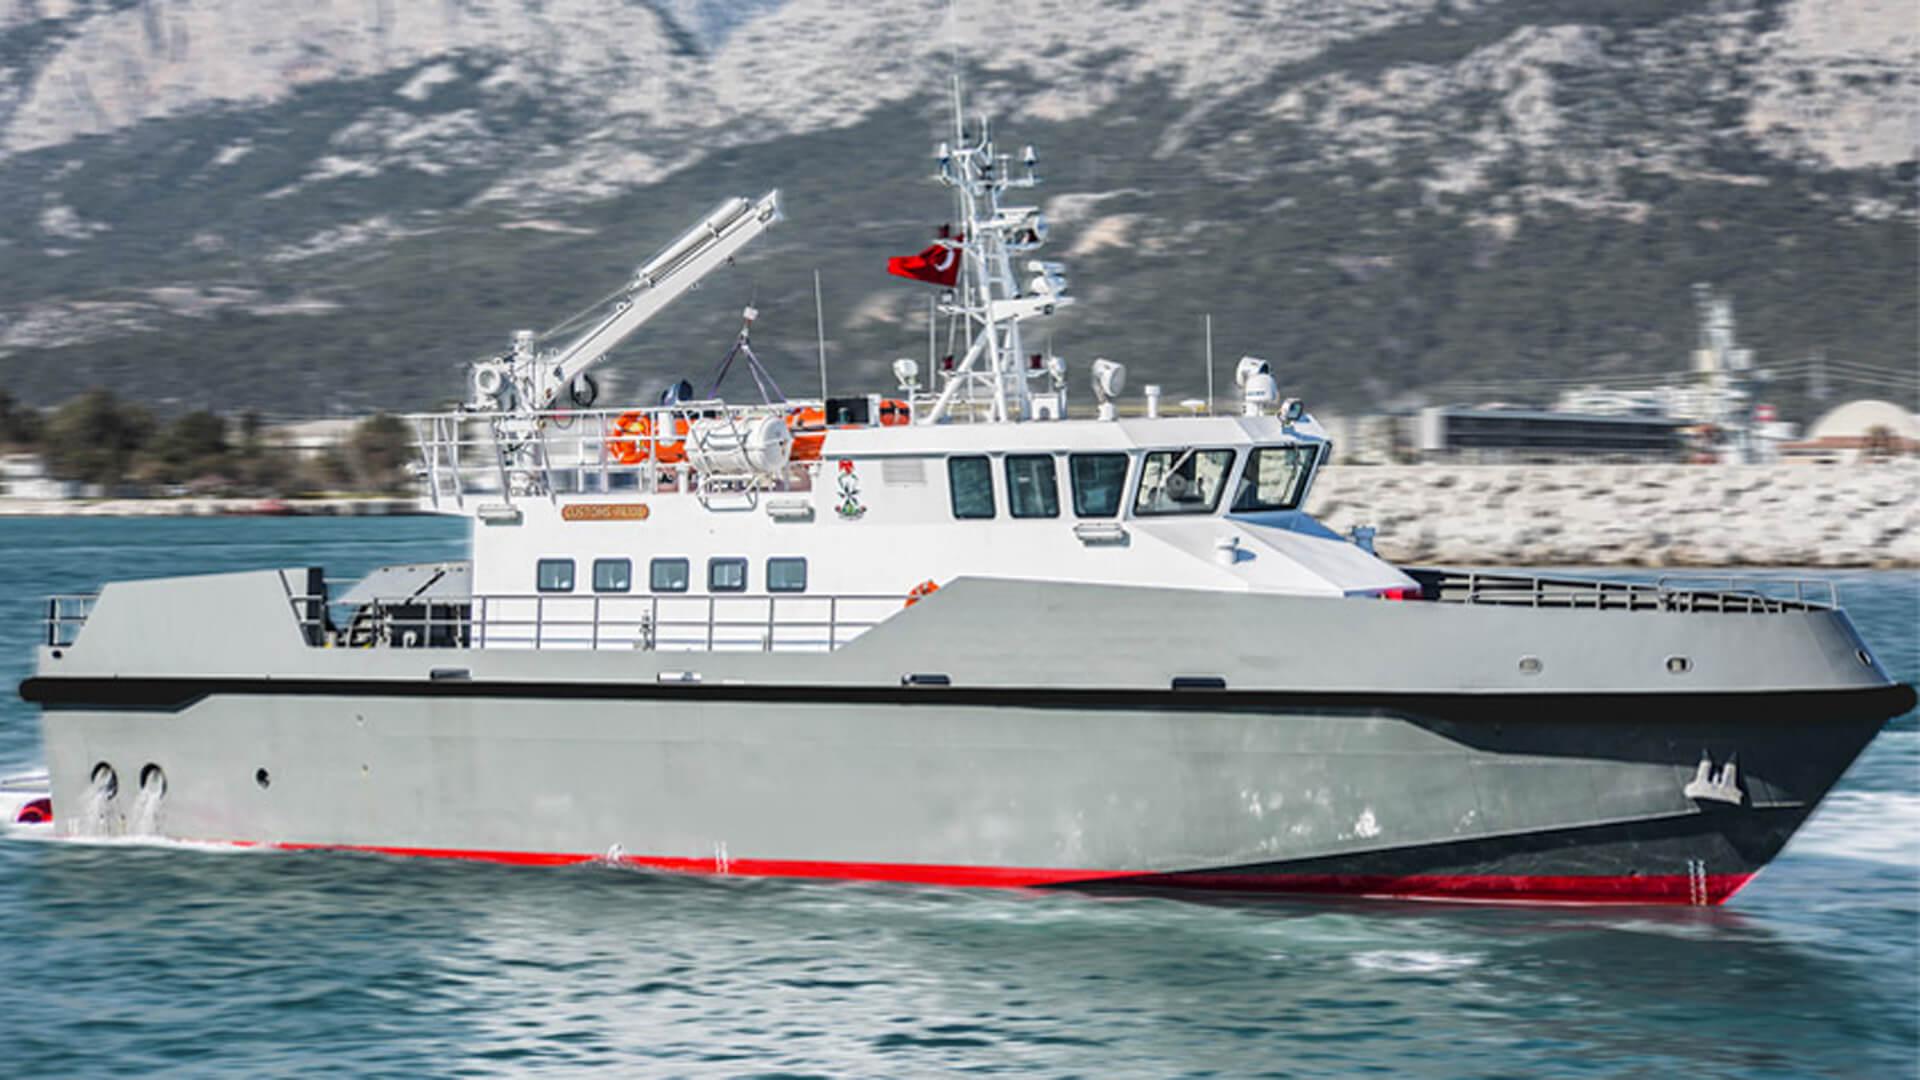 images/vessels/01-patrol-craft/05-series-fpb/02-ares-knd-30-fpb/01.jpg